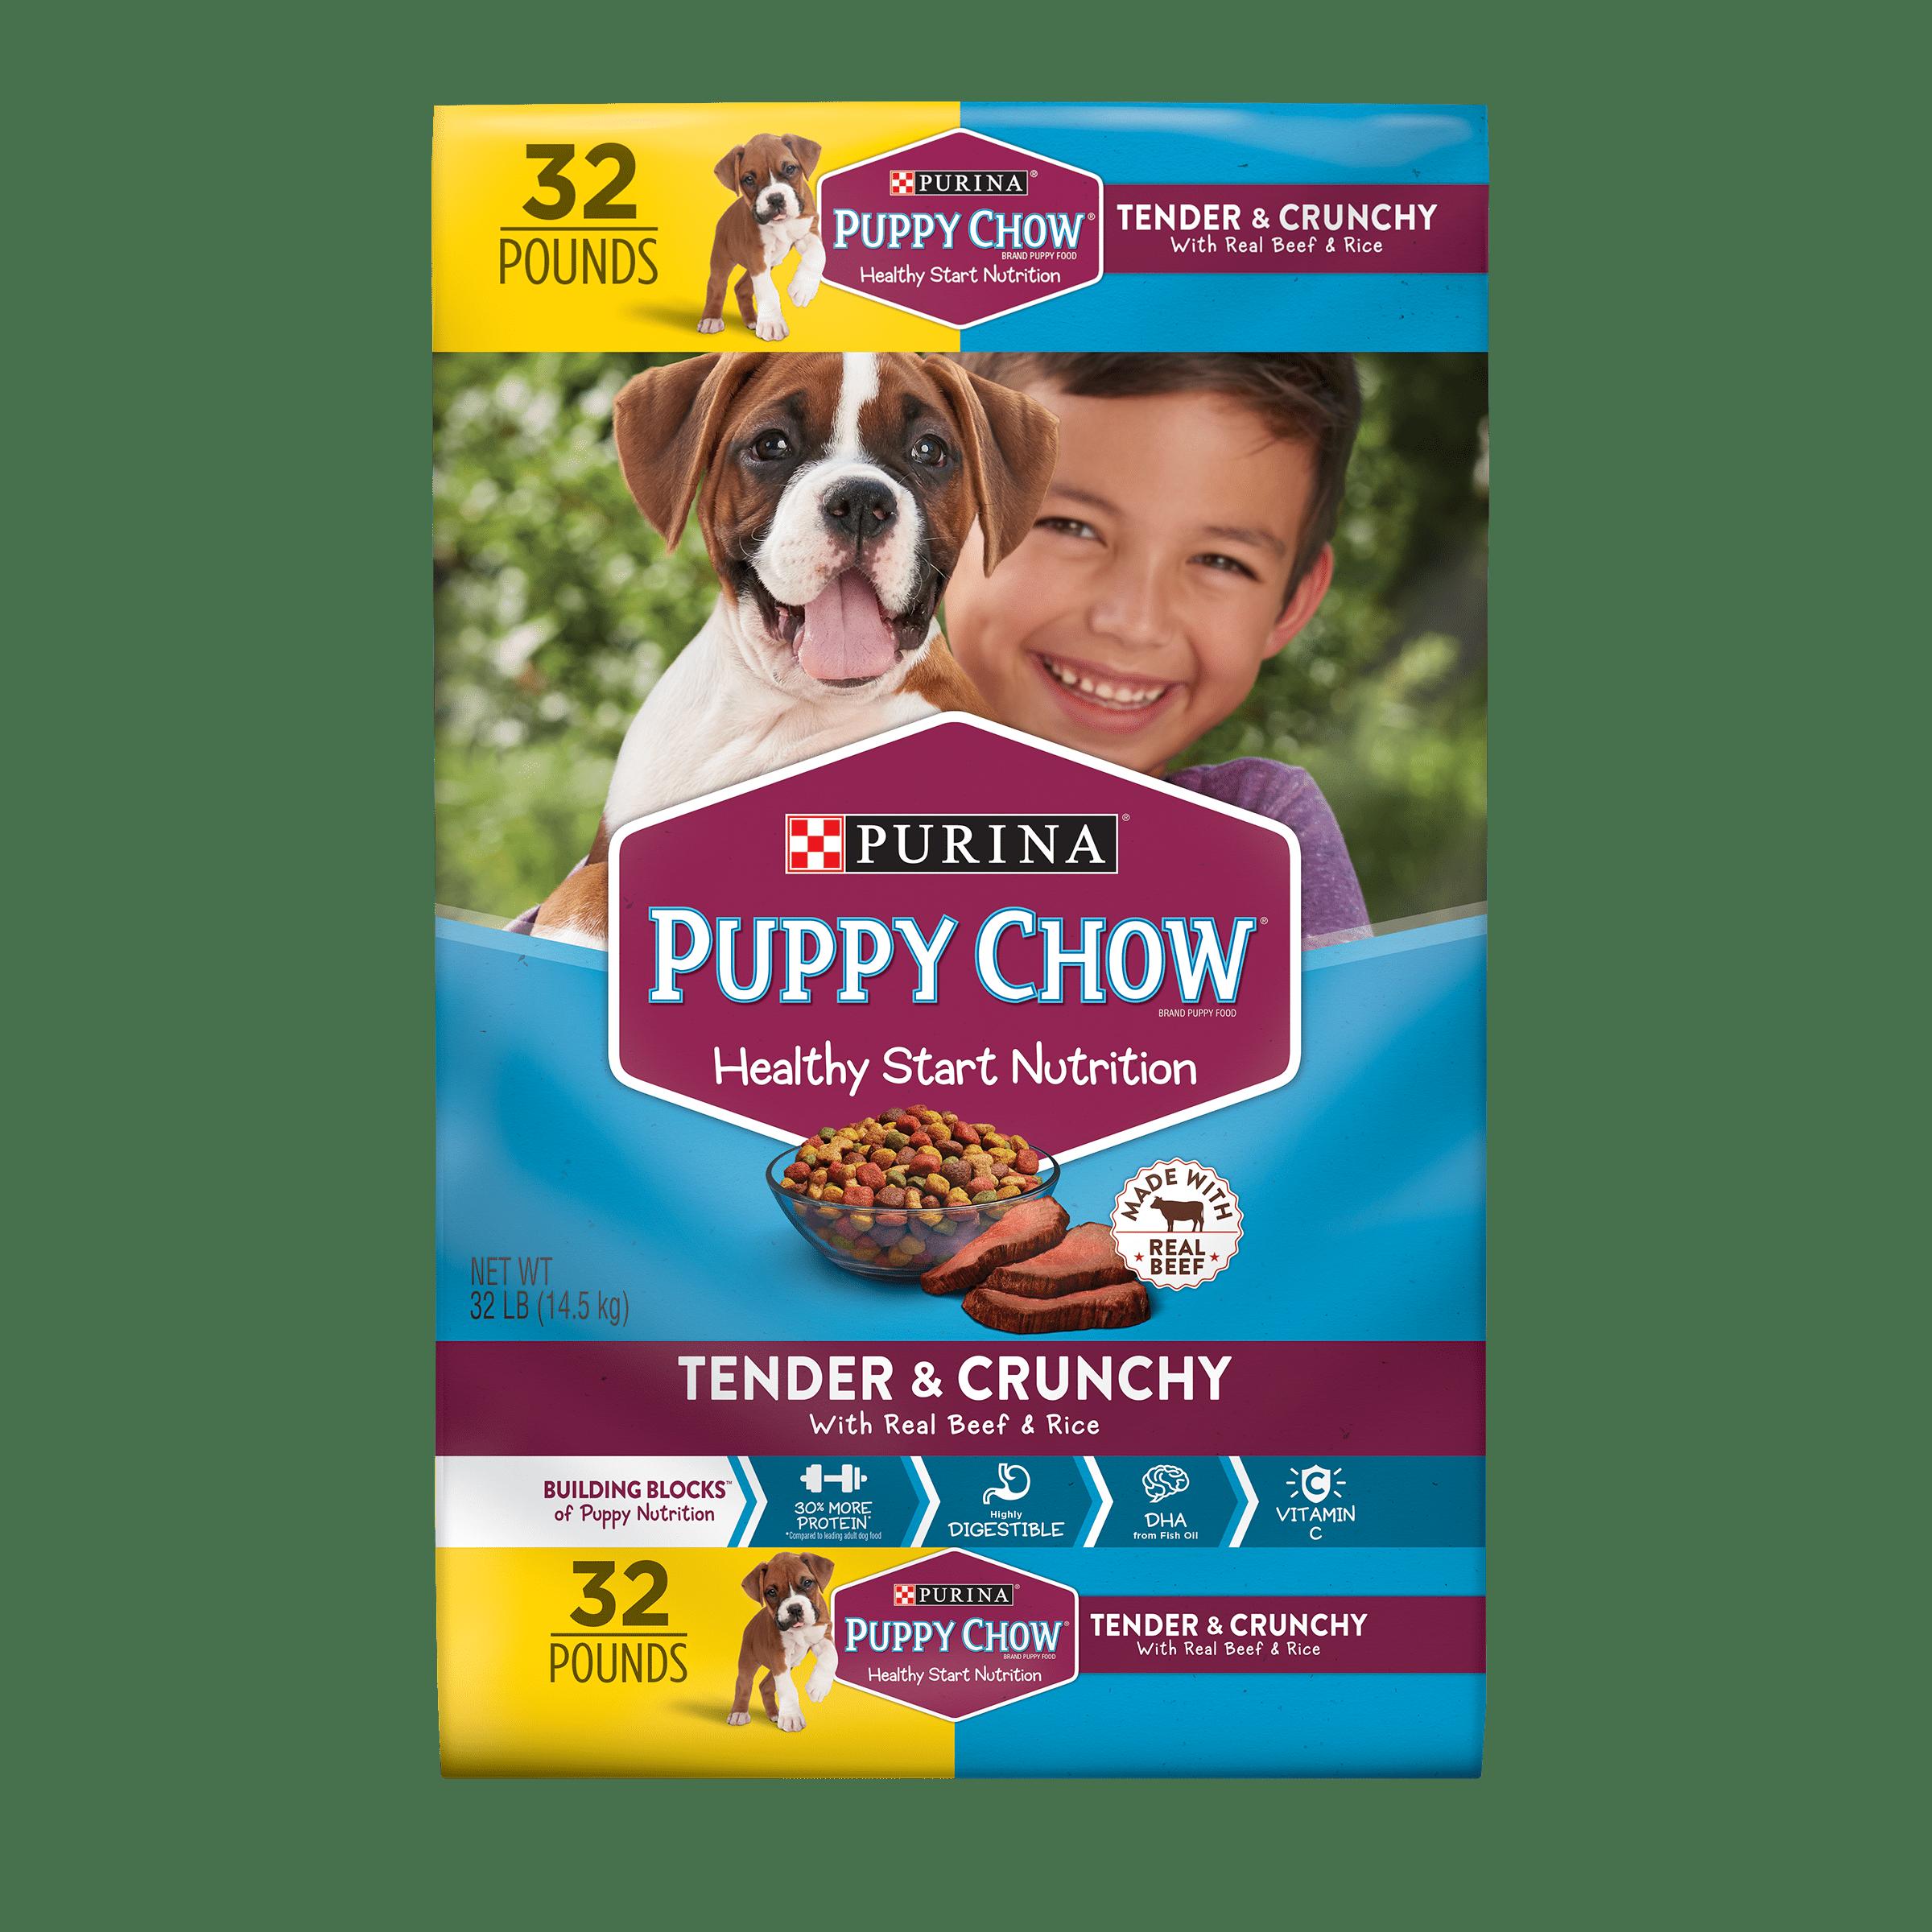 Purina Puppy Chow Tender & Crunchy Dry Puppy Food - 32 lb. Bag